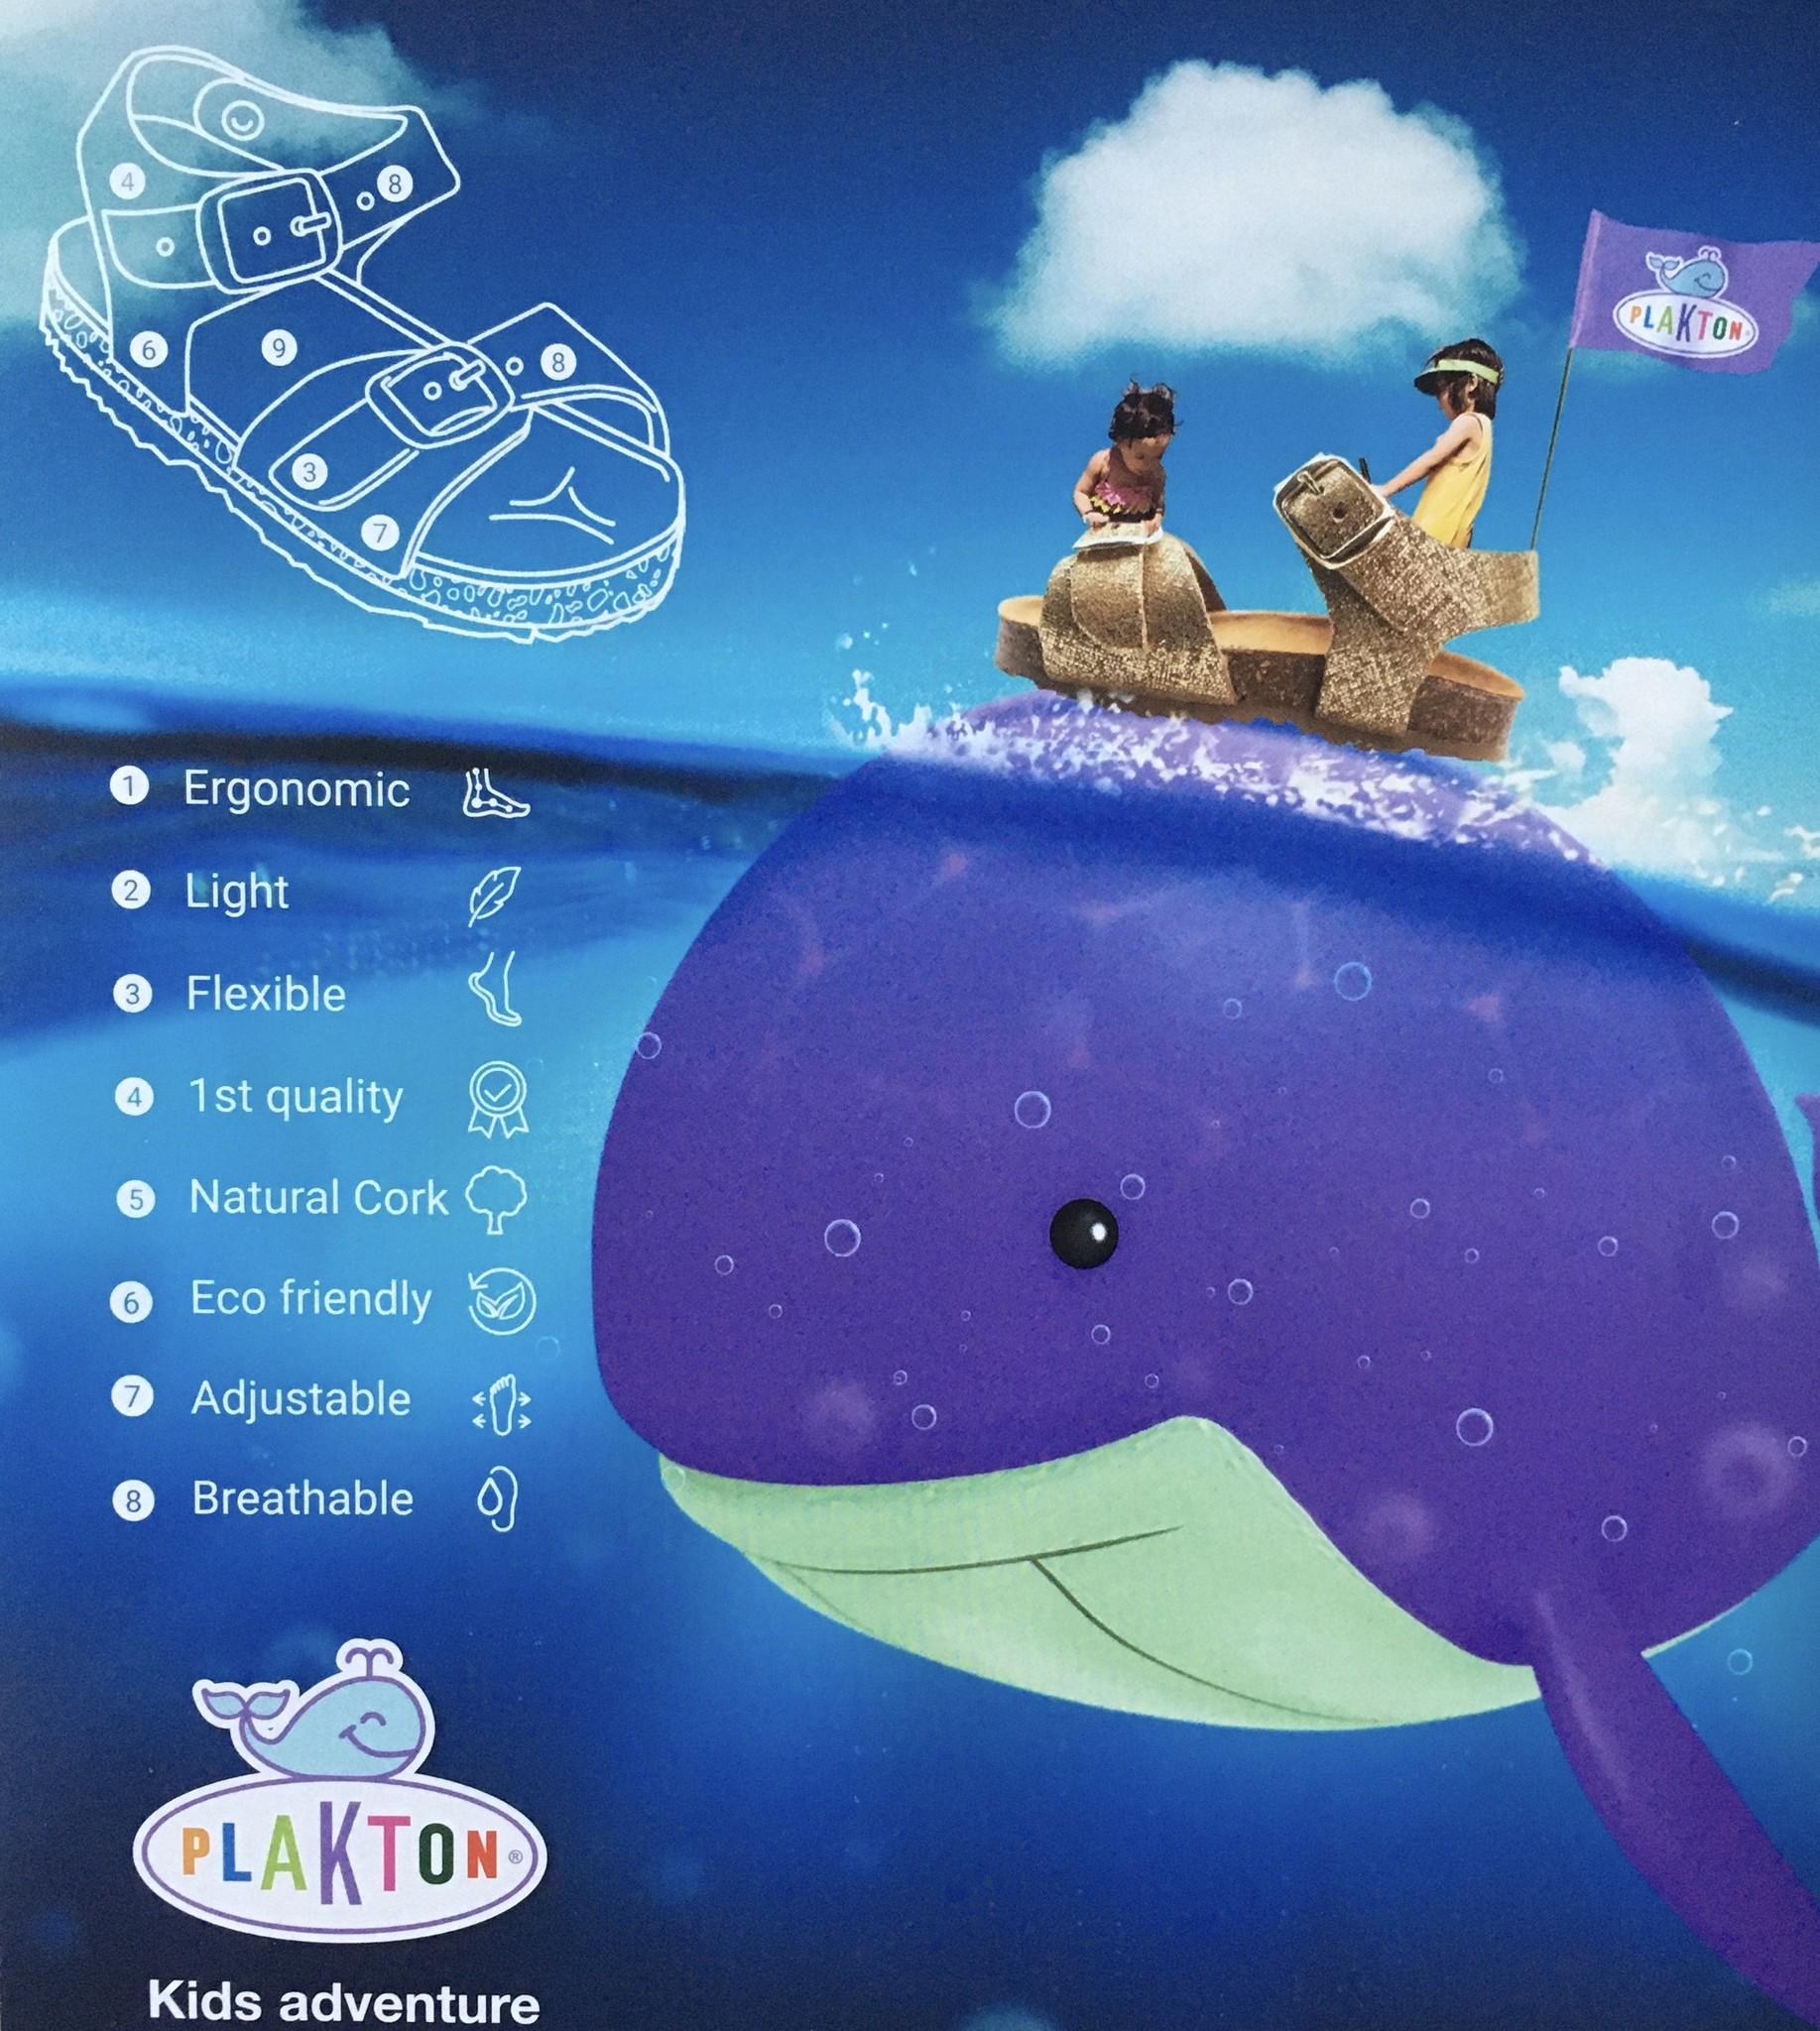 PLAKTON SANDALS leren kinderslipper kurk BOLERO - nubuckleer licht roze  - 24 tm 34